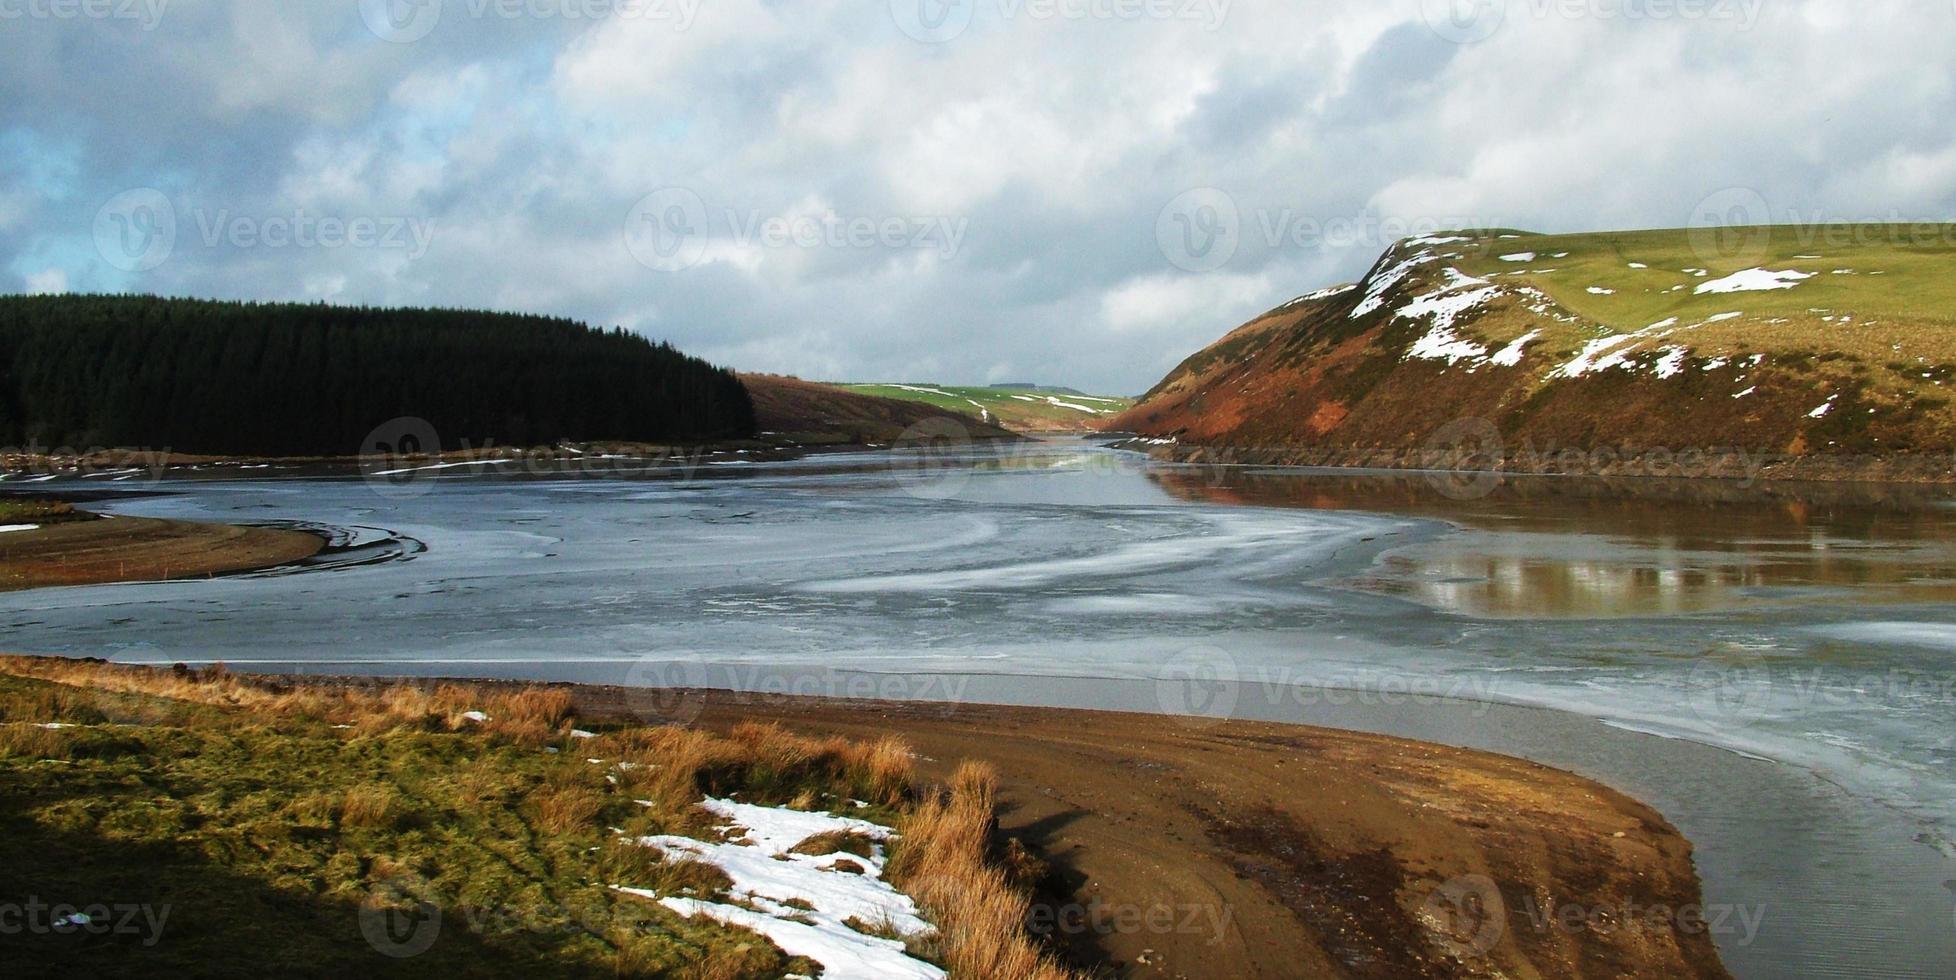 Winter Landscape 008 photo